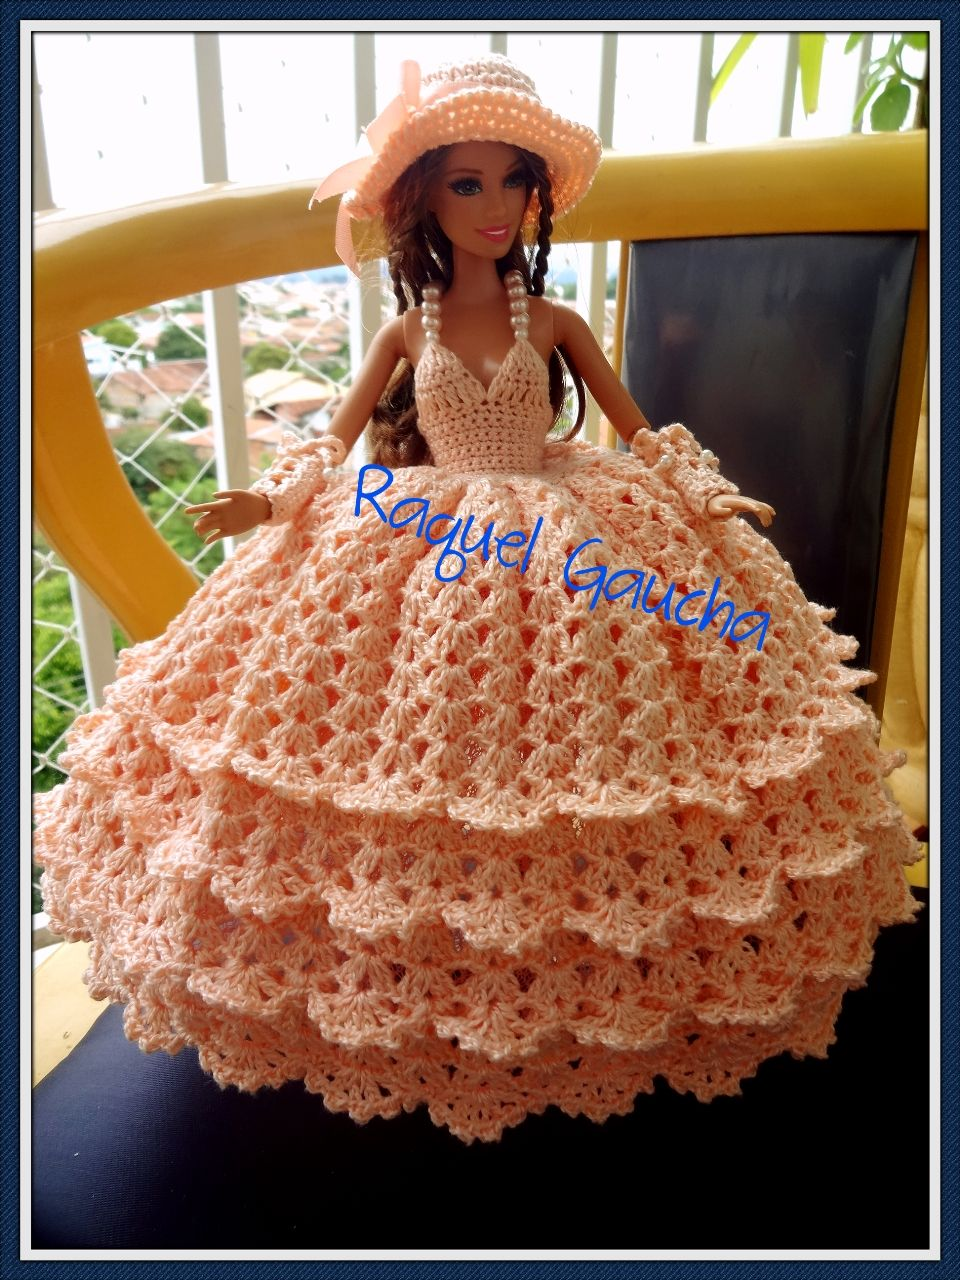 Pin von Florence Petrik auf Crochet   Pinterest   Barbie ...